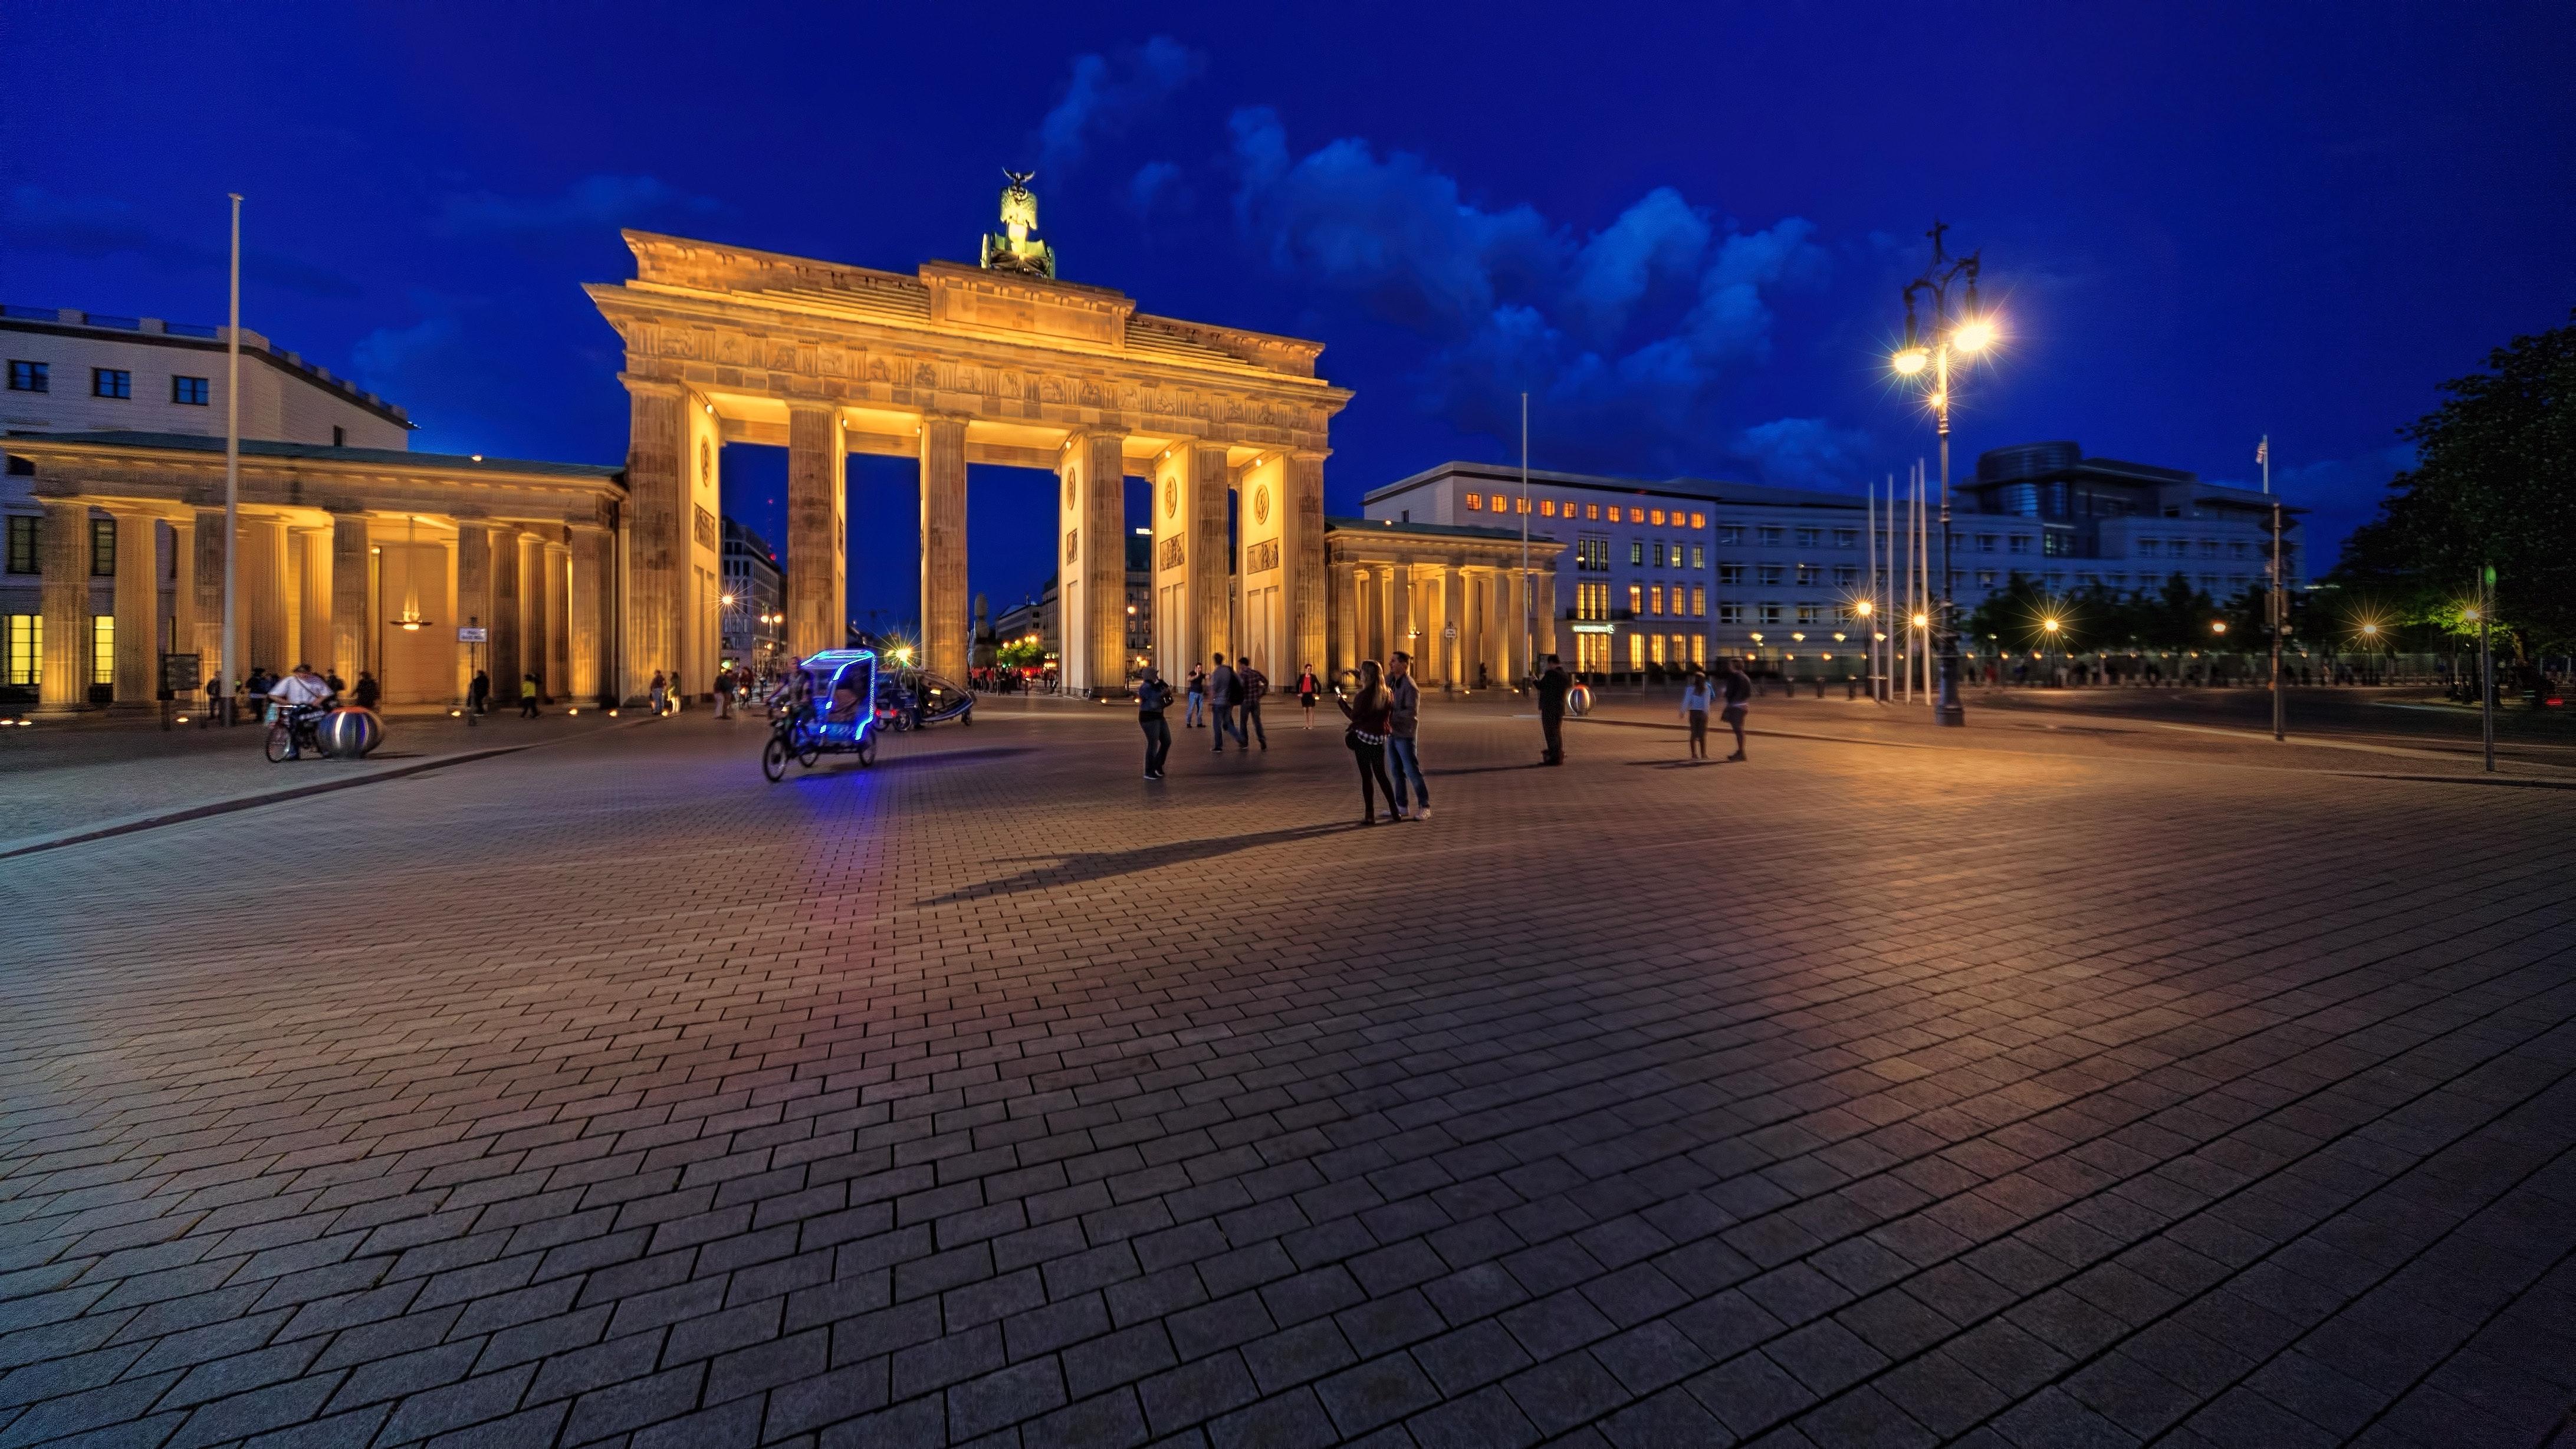 abend-berlin-brandenburger-tor-1114892.j